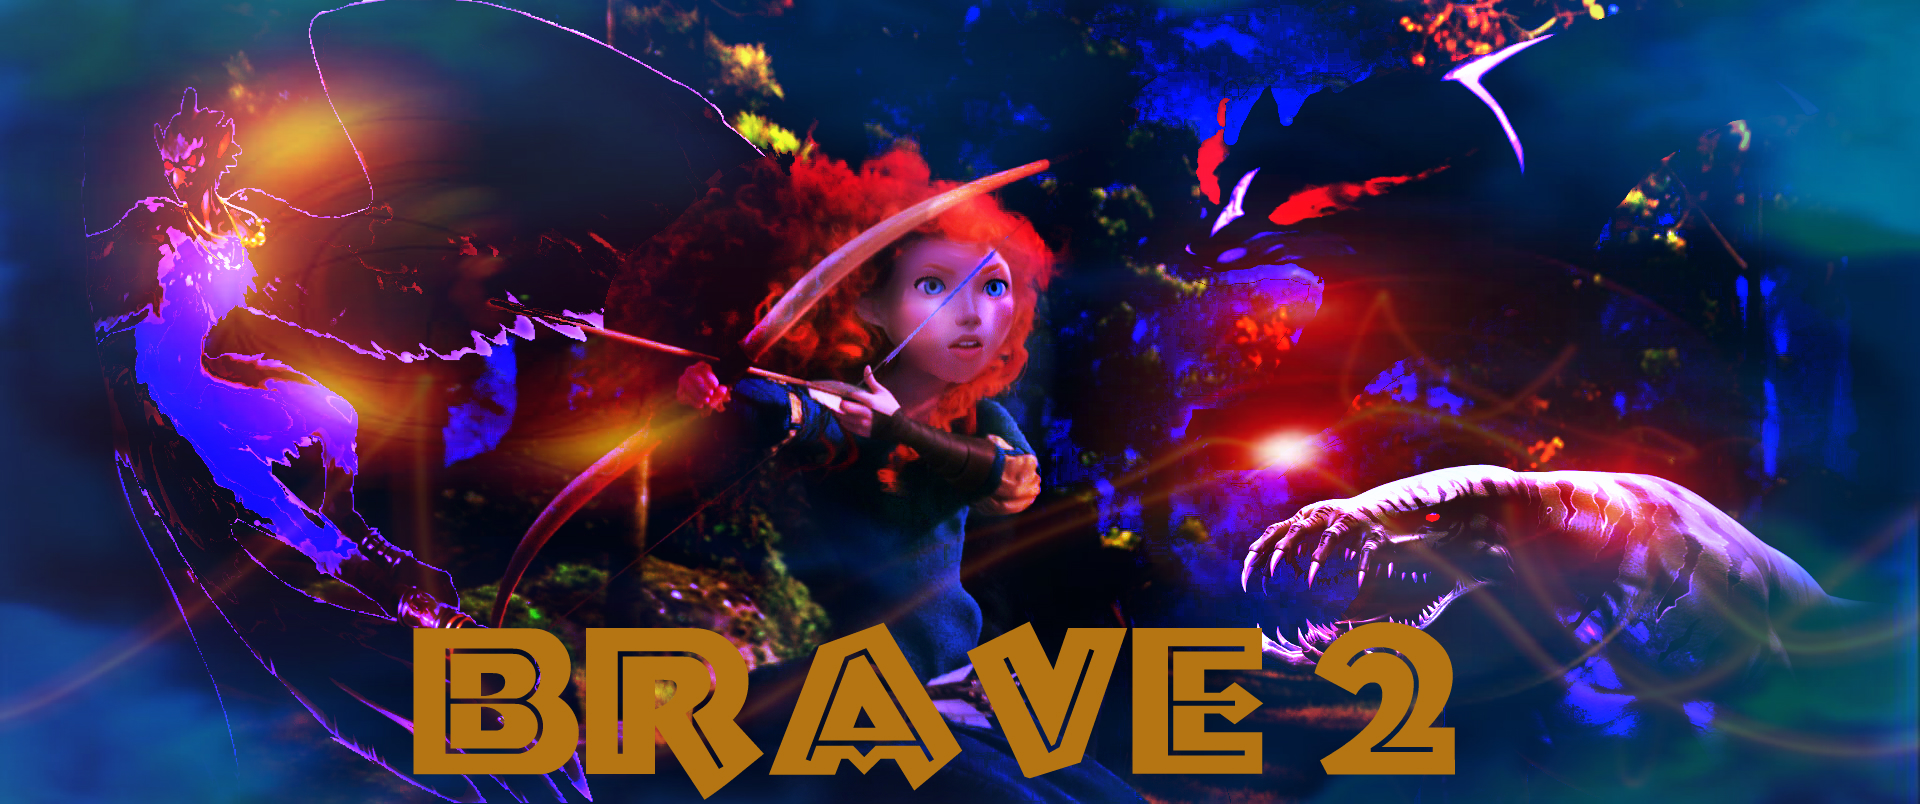 Brave 2 poster